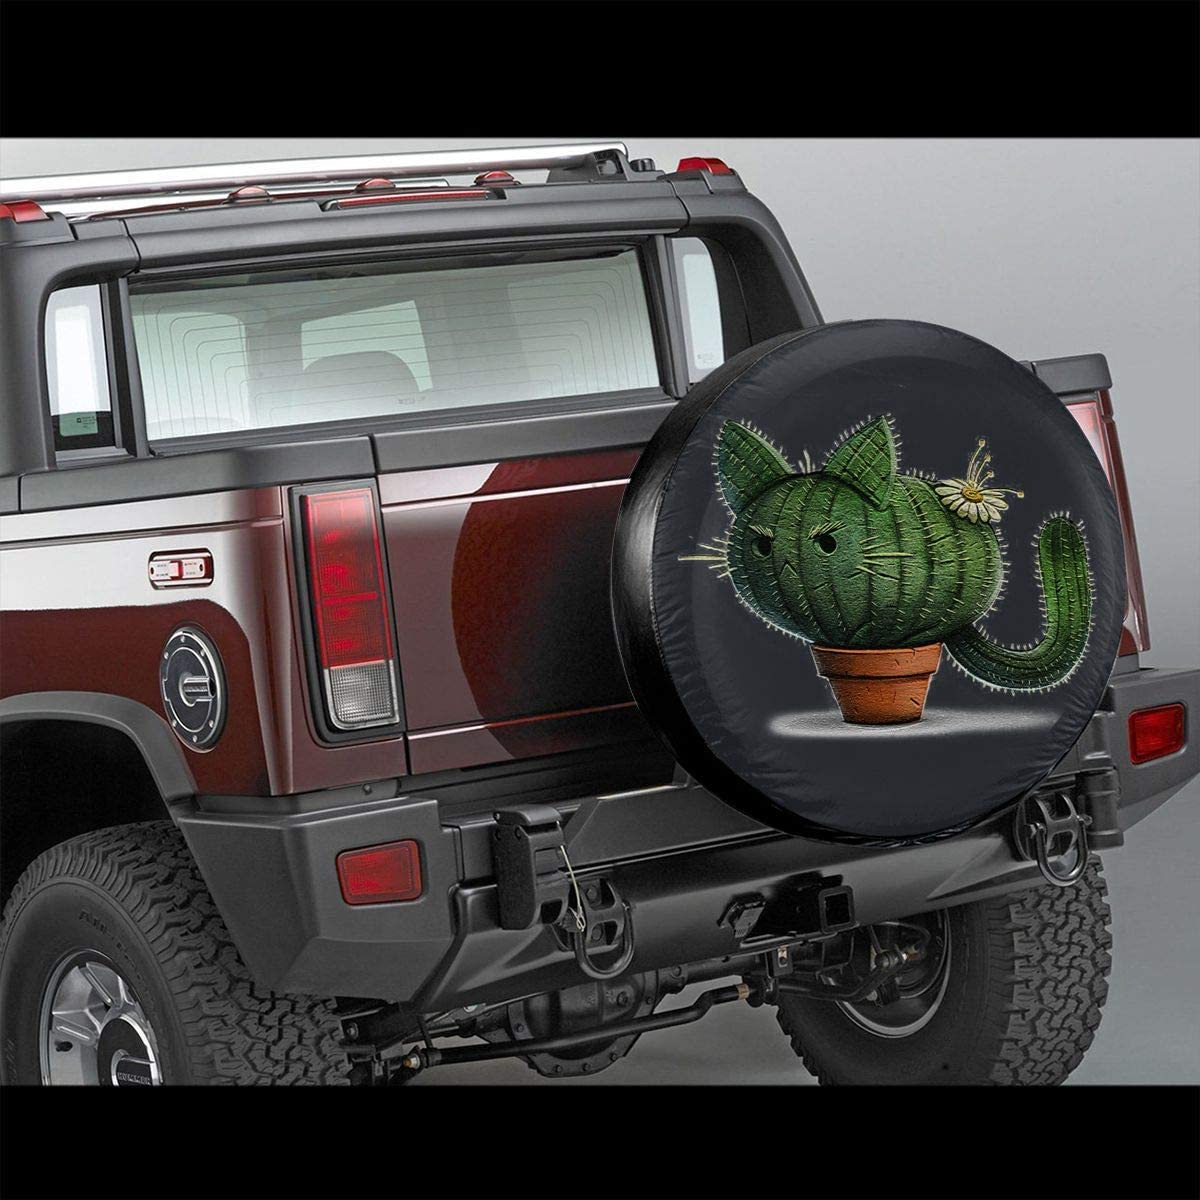 14,15,16,17 Inch Vbnbvn Cubierta de La Rueda de Repuesto Cactus Painting Universal Dust-Proof Corrosion Protection Wheel Covers for Jeep Trailer RV SUV Truck Camper Travel Trailer Accessories